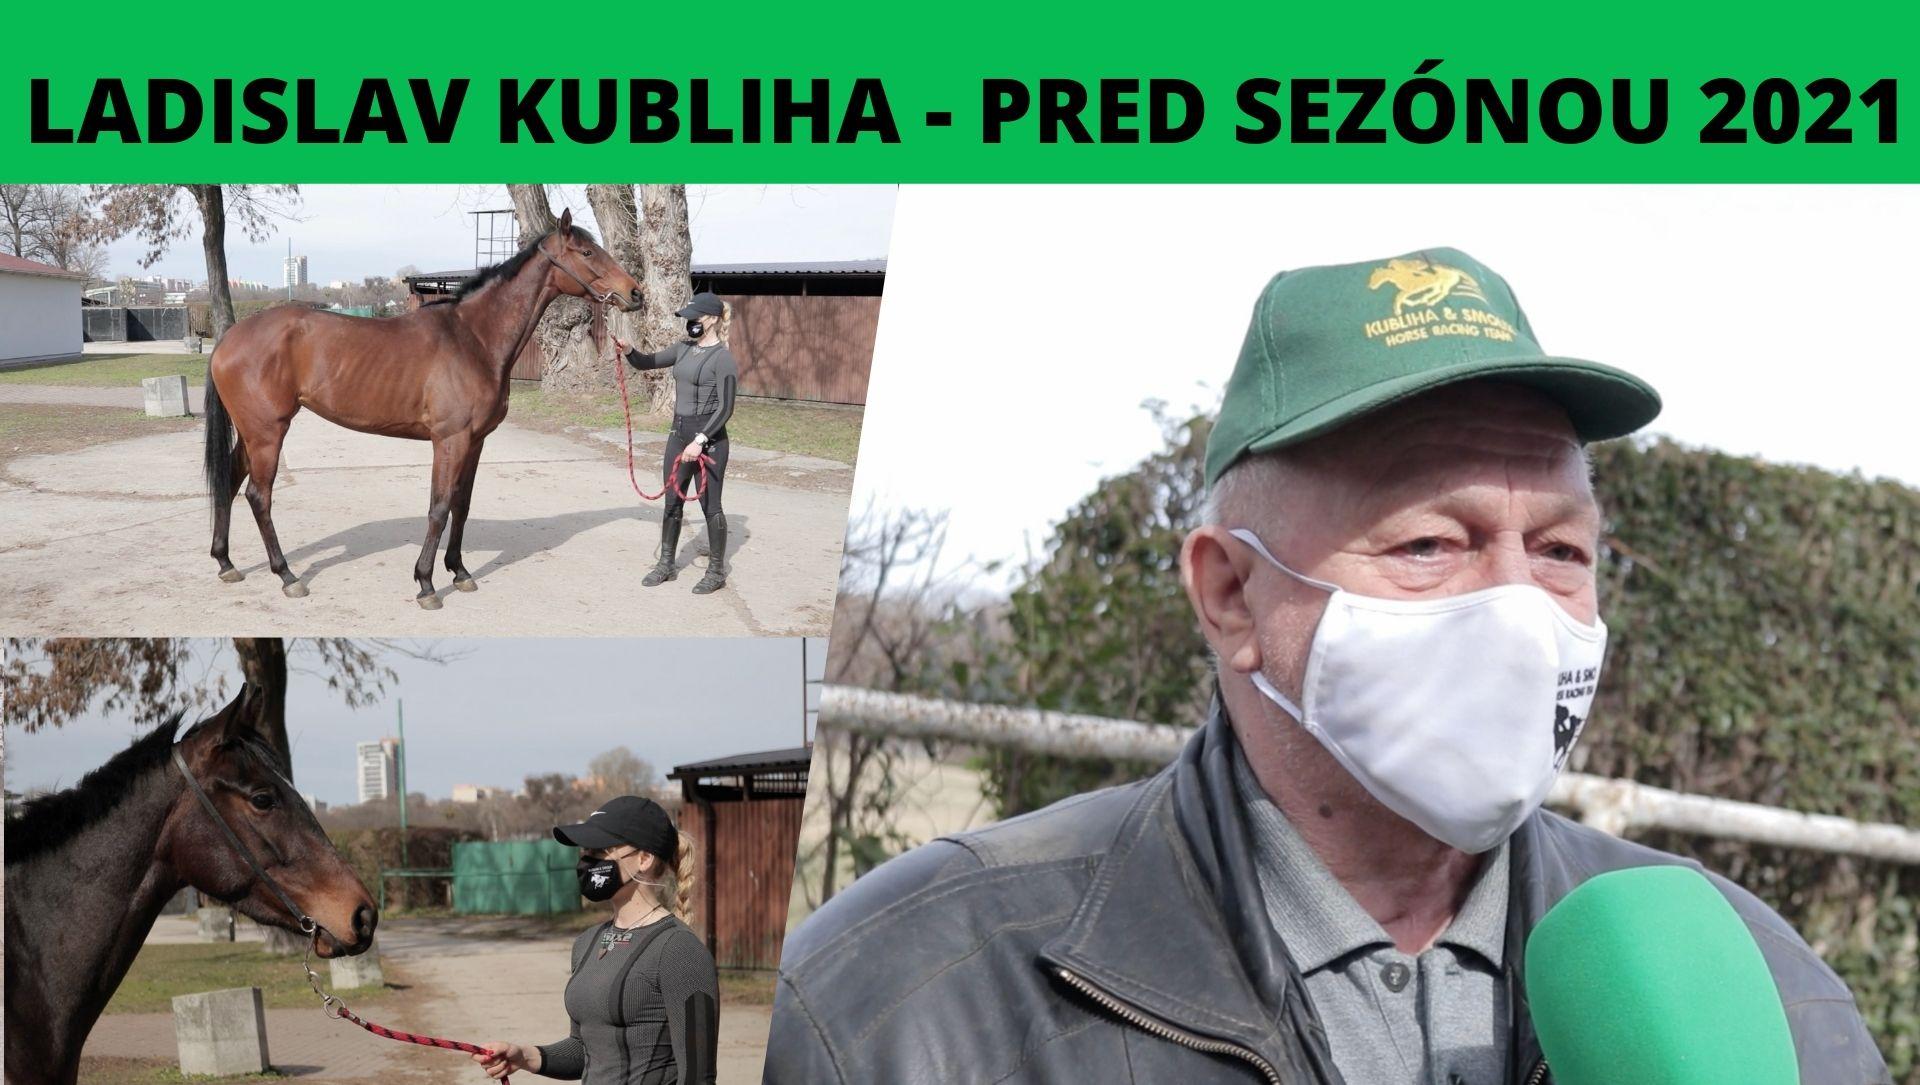 Ladislav Kubliha: Novinky zo stajní slovenských trénerov